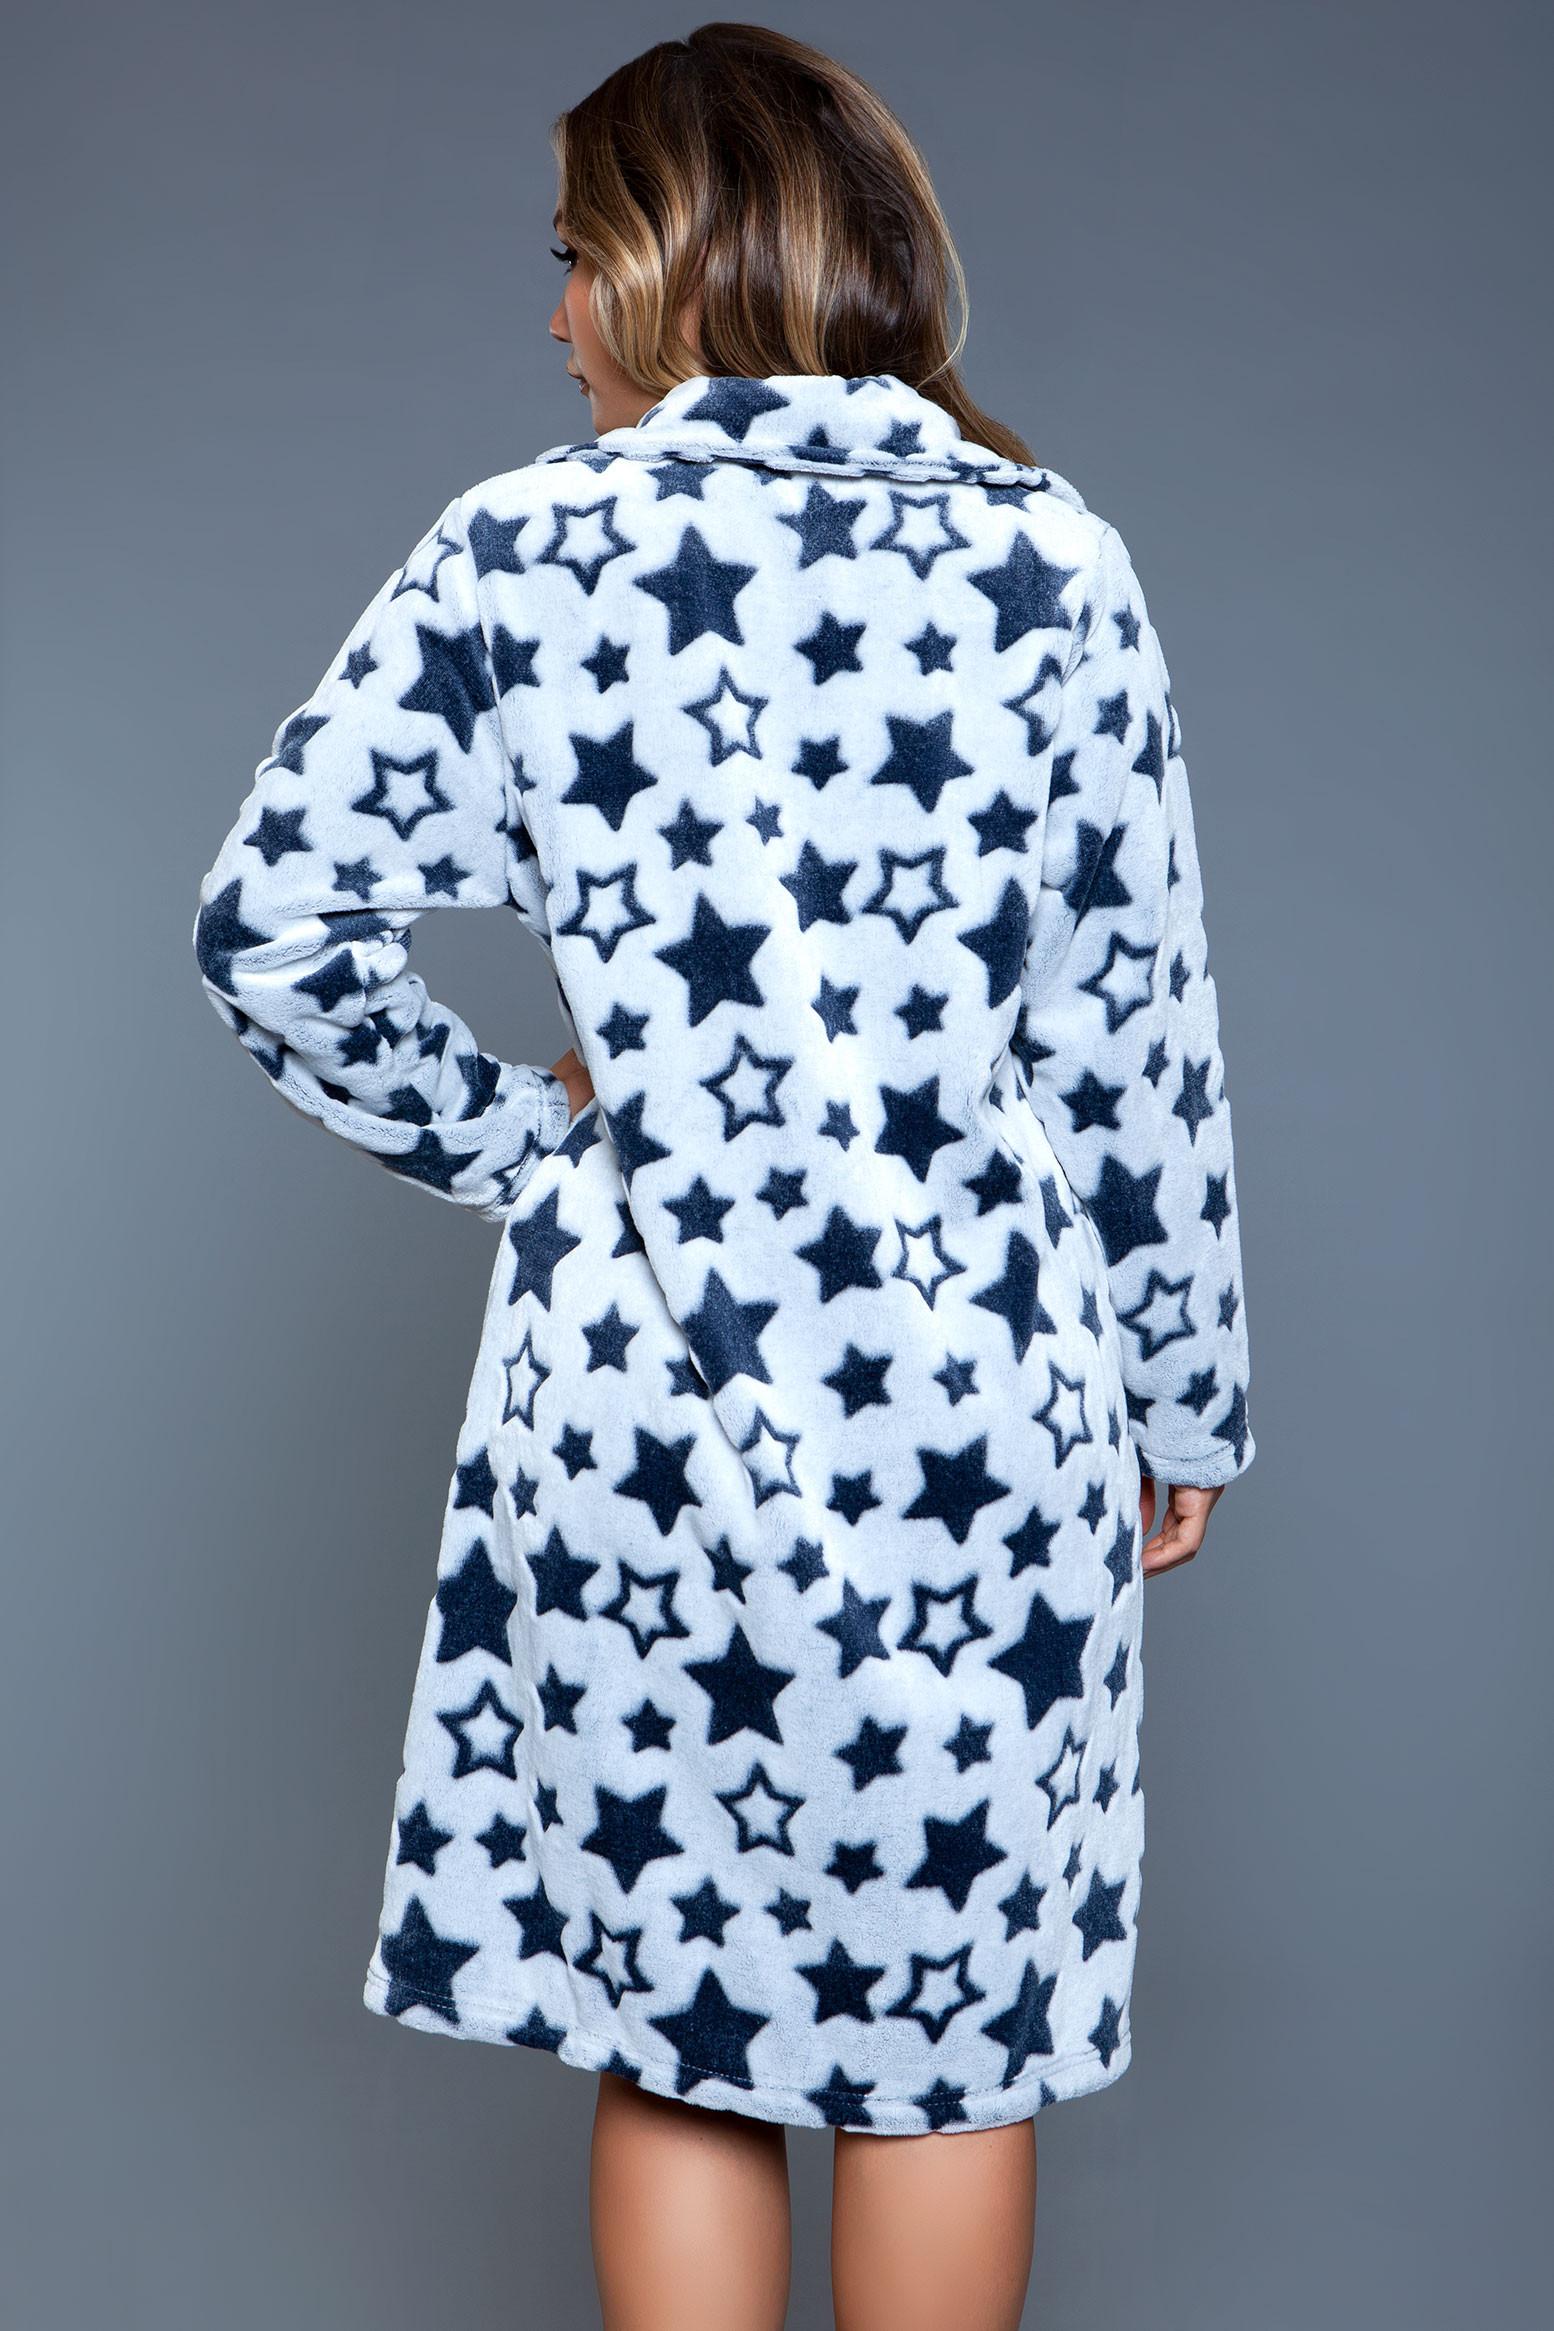 2068 Starry Robe